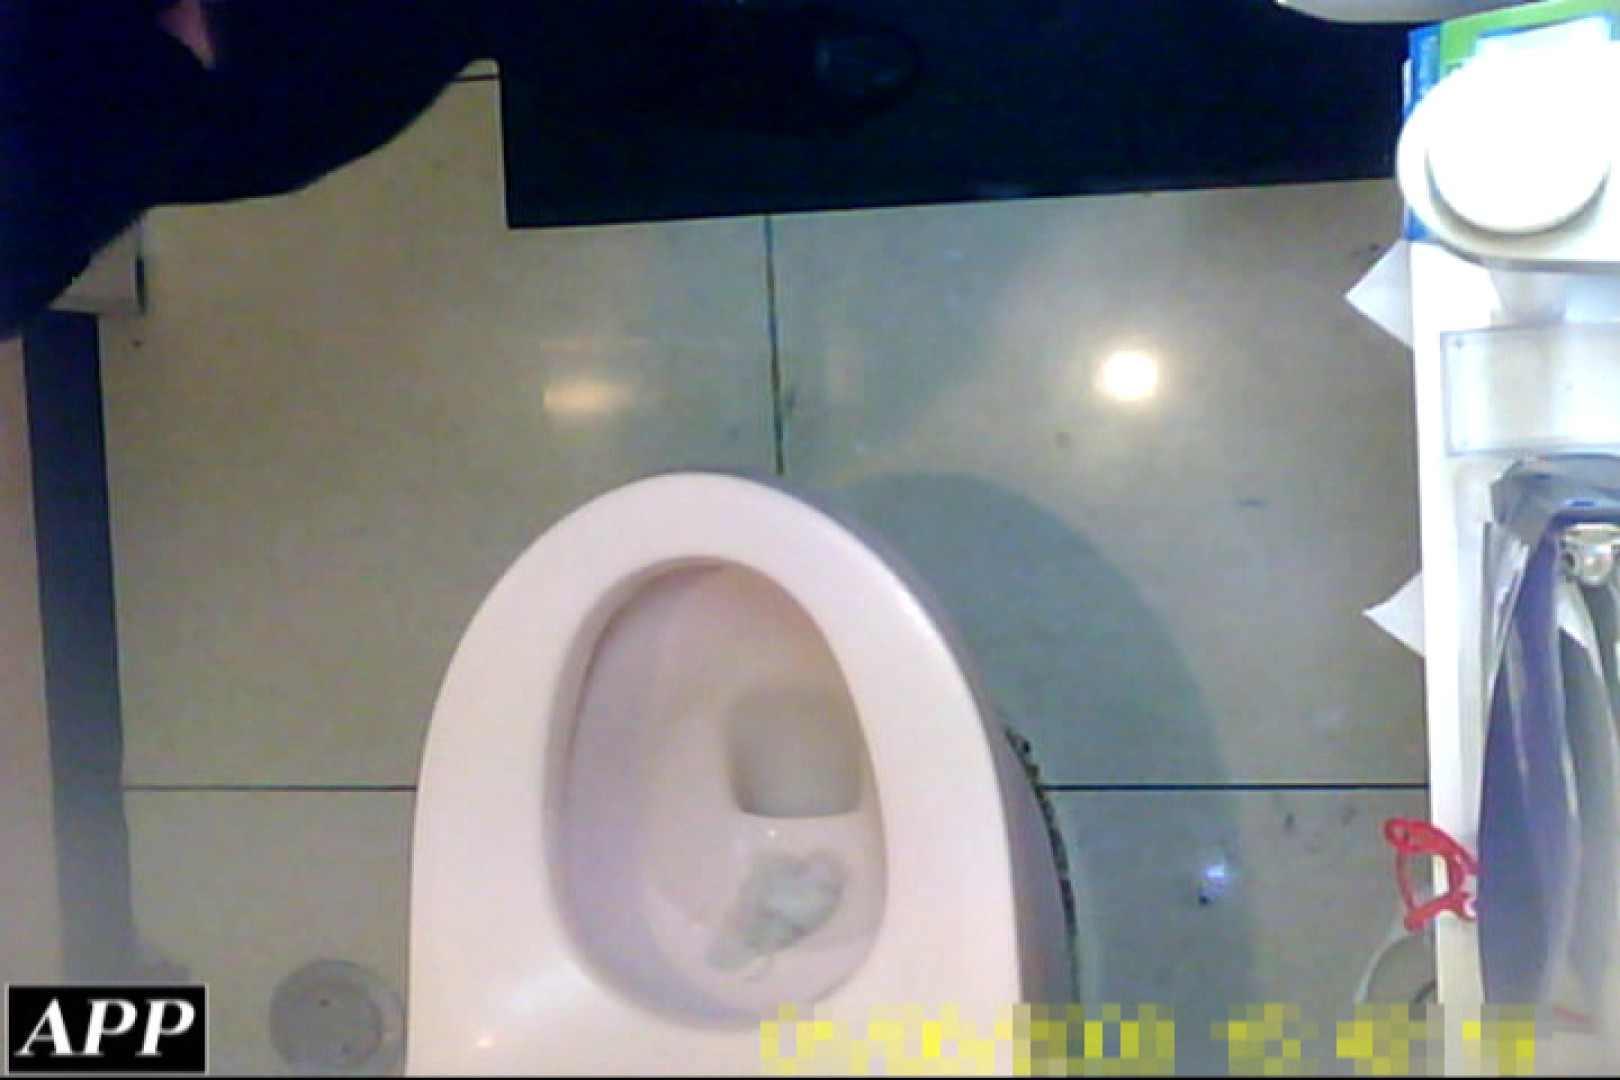 3視点洗面所 vol.092 洗面所 | OLセックス  101画像 57